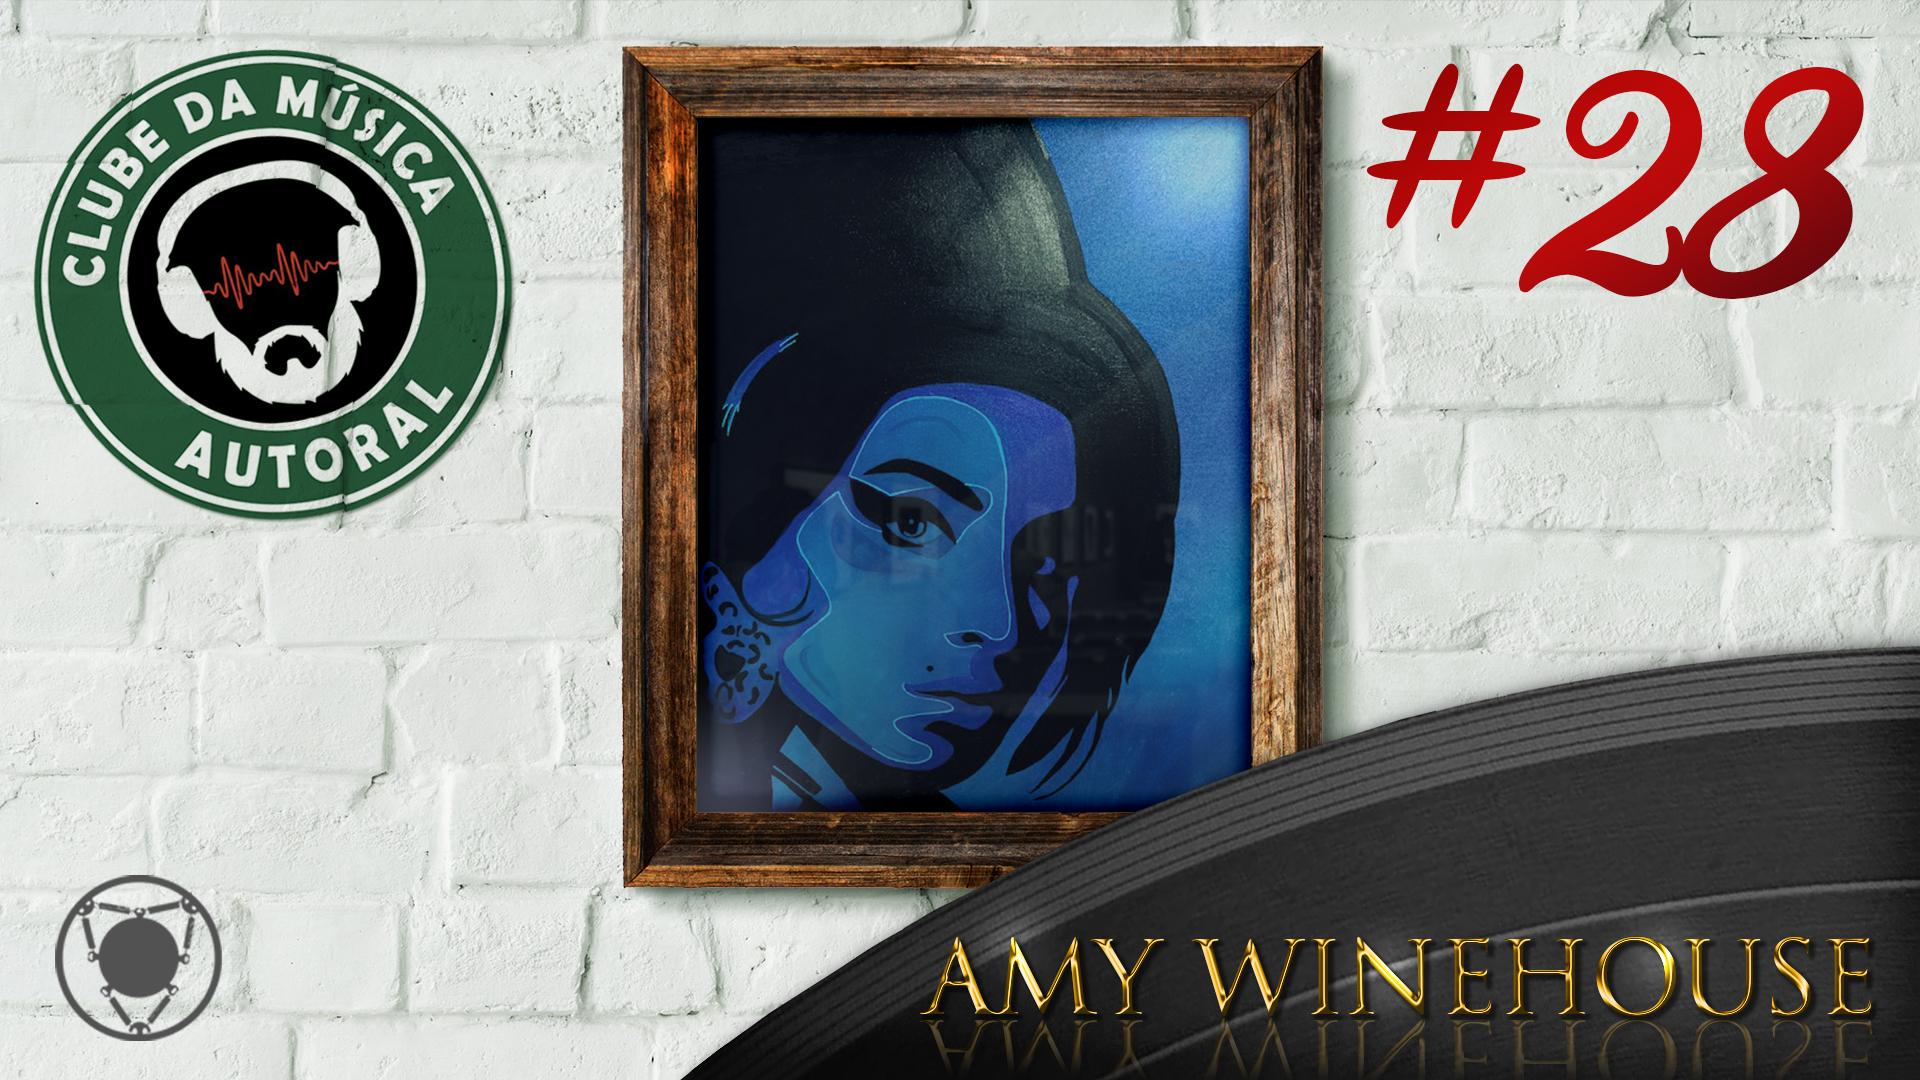 Amy Winehouse Nua 28 – amy winehouse, back to black – clube da mÚsica autoral